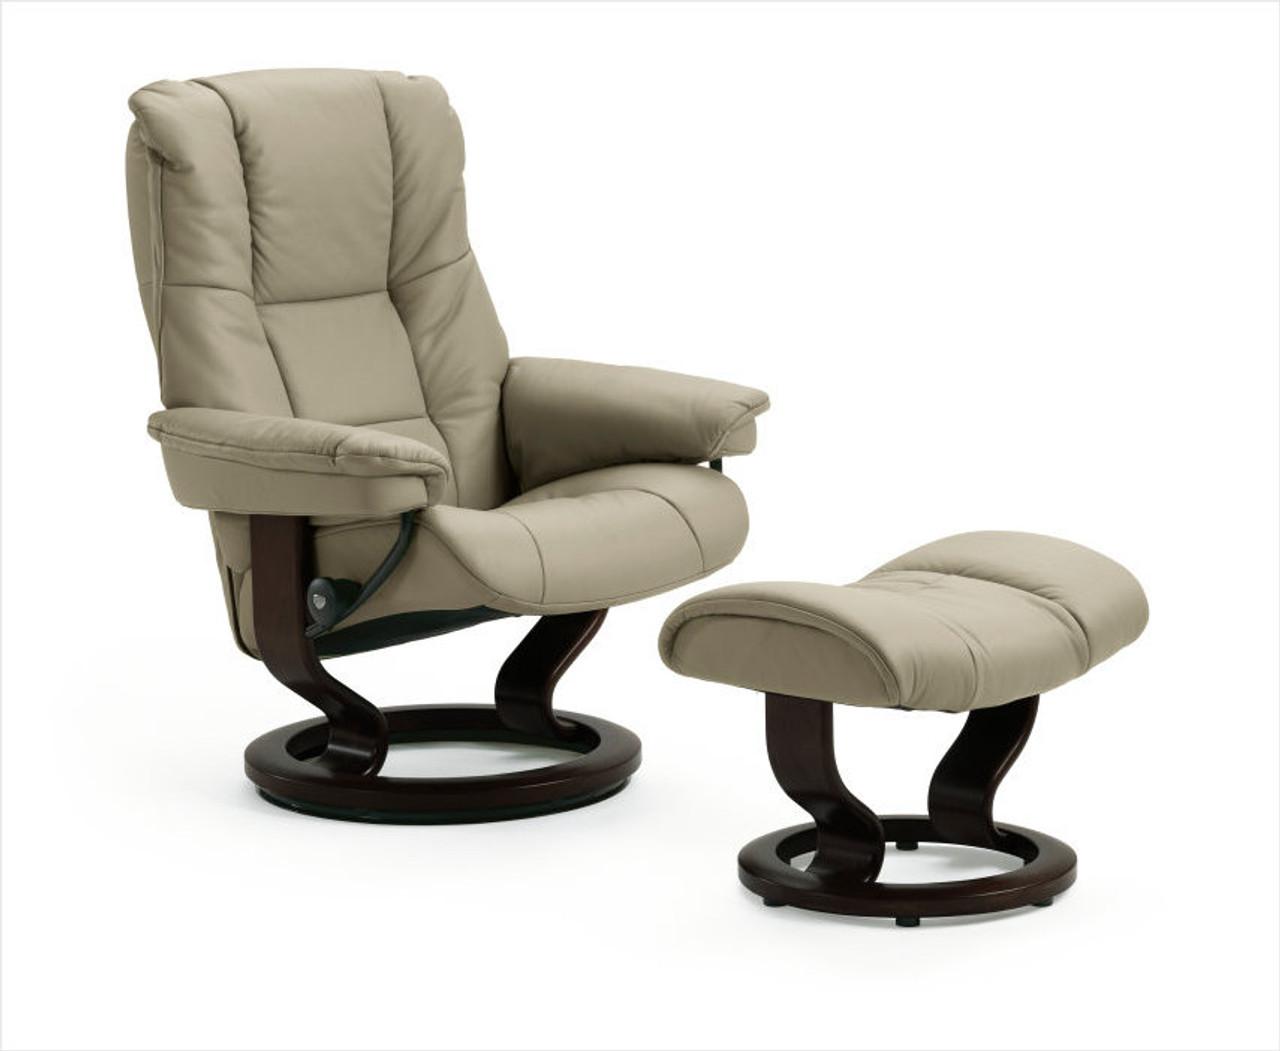 0004c9fe6b1c7 Stone Paloma shown on this Mayfair Large (Kensington) recliner chair.